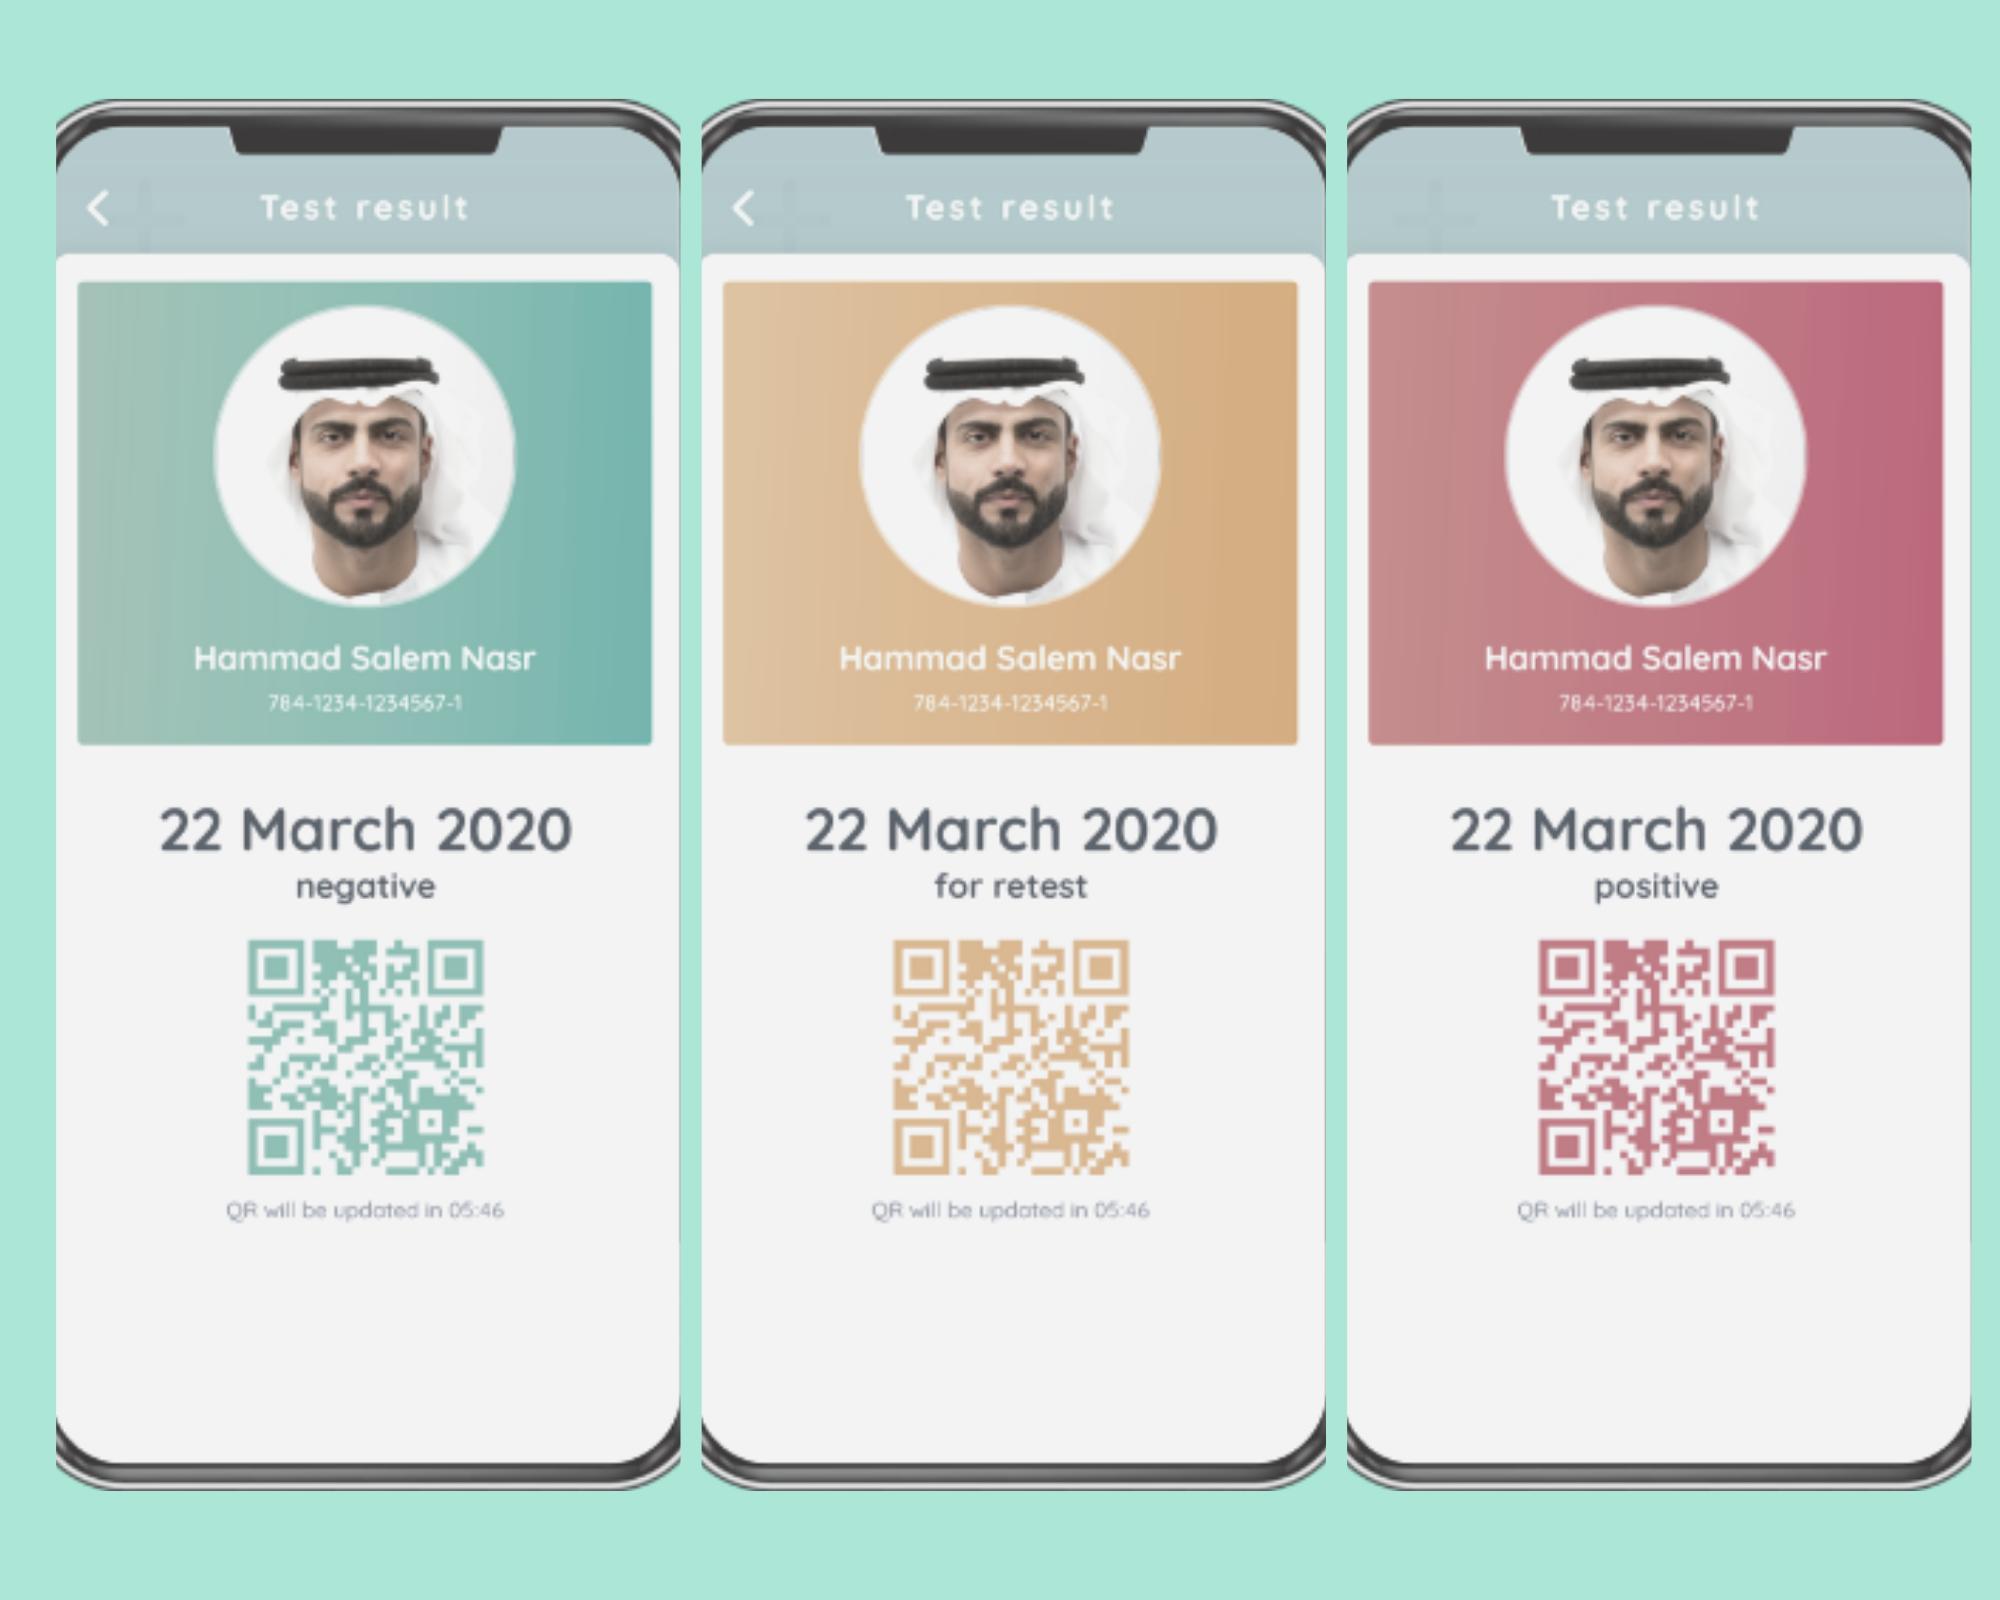 Al Hosn App Colour Codes Meaning